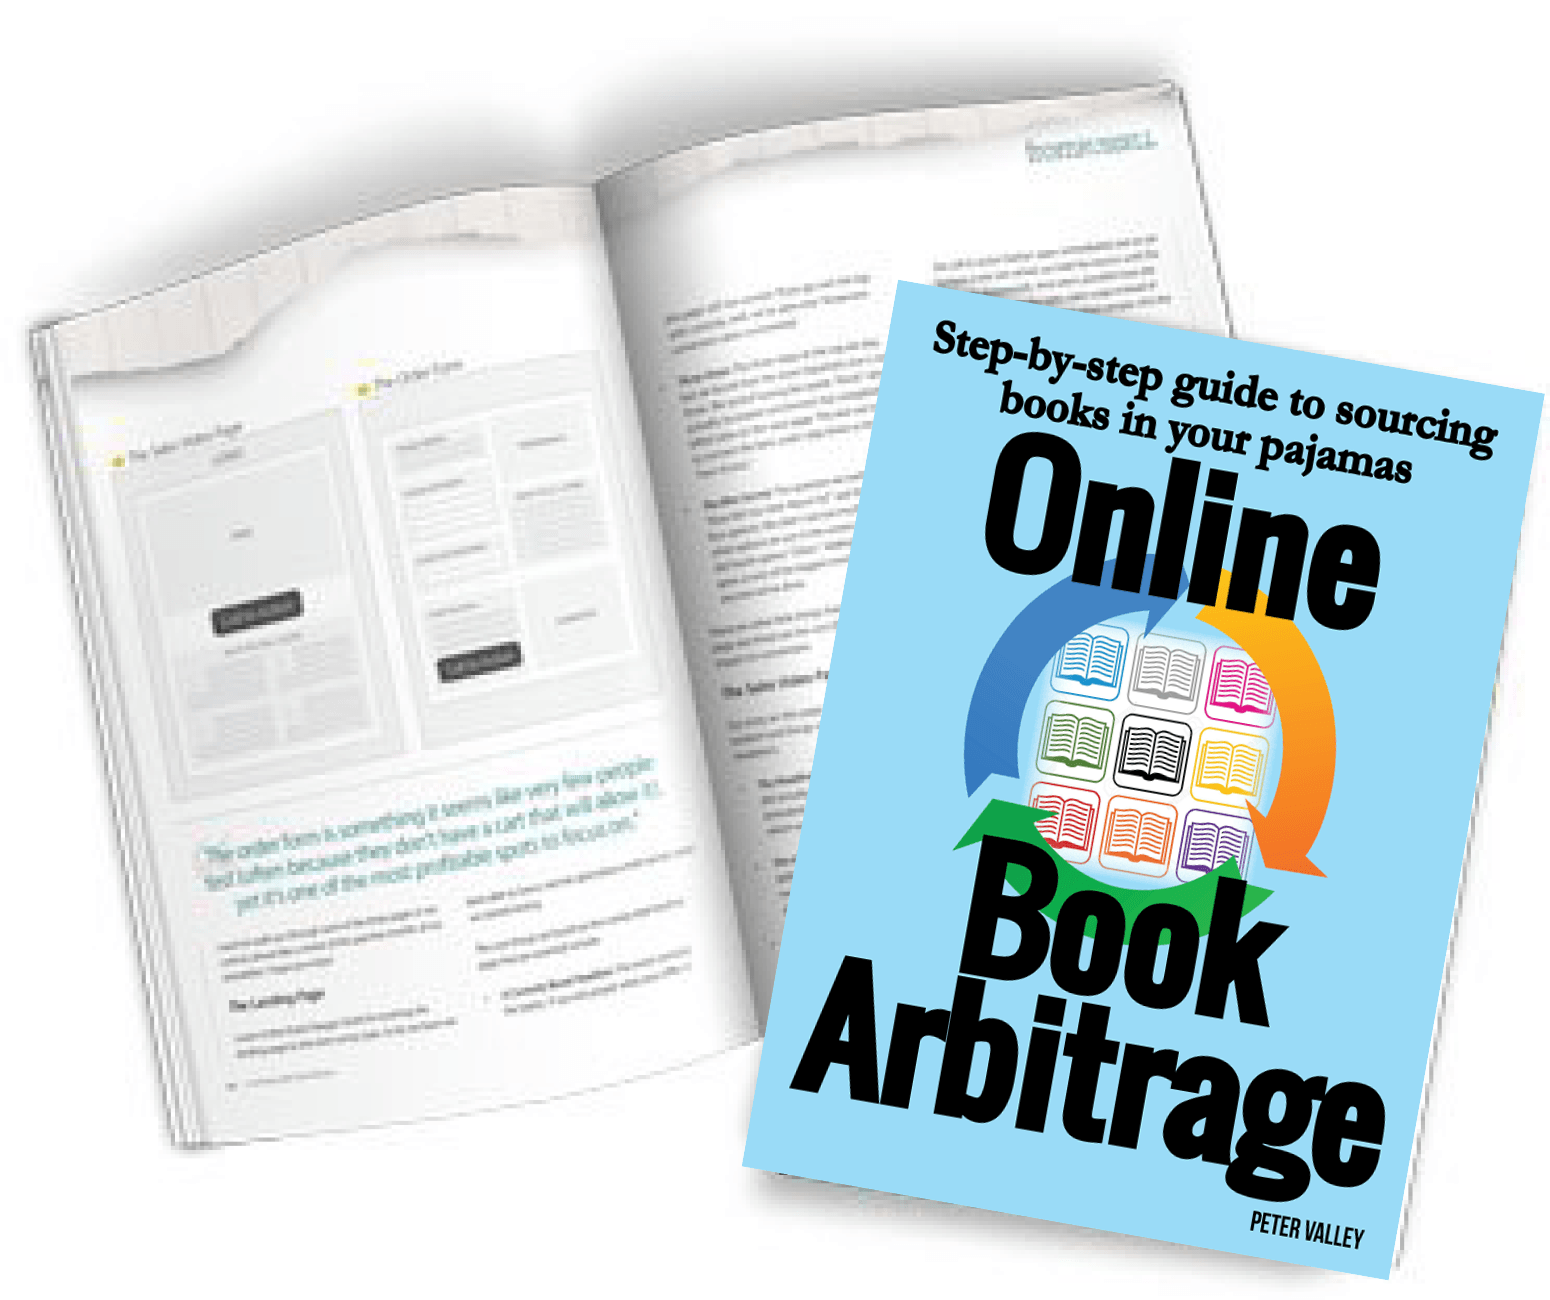 line Book Arbitrage Free book